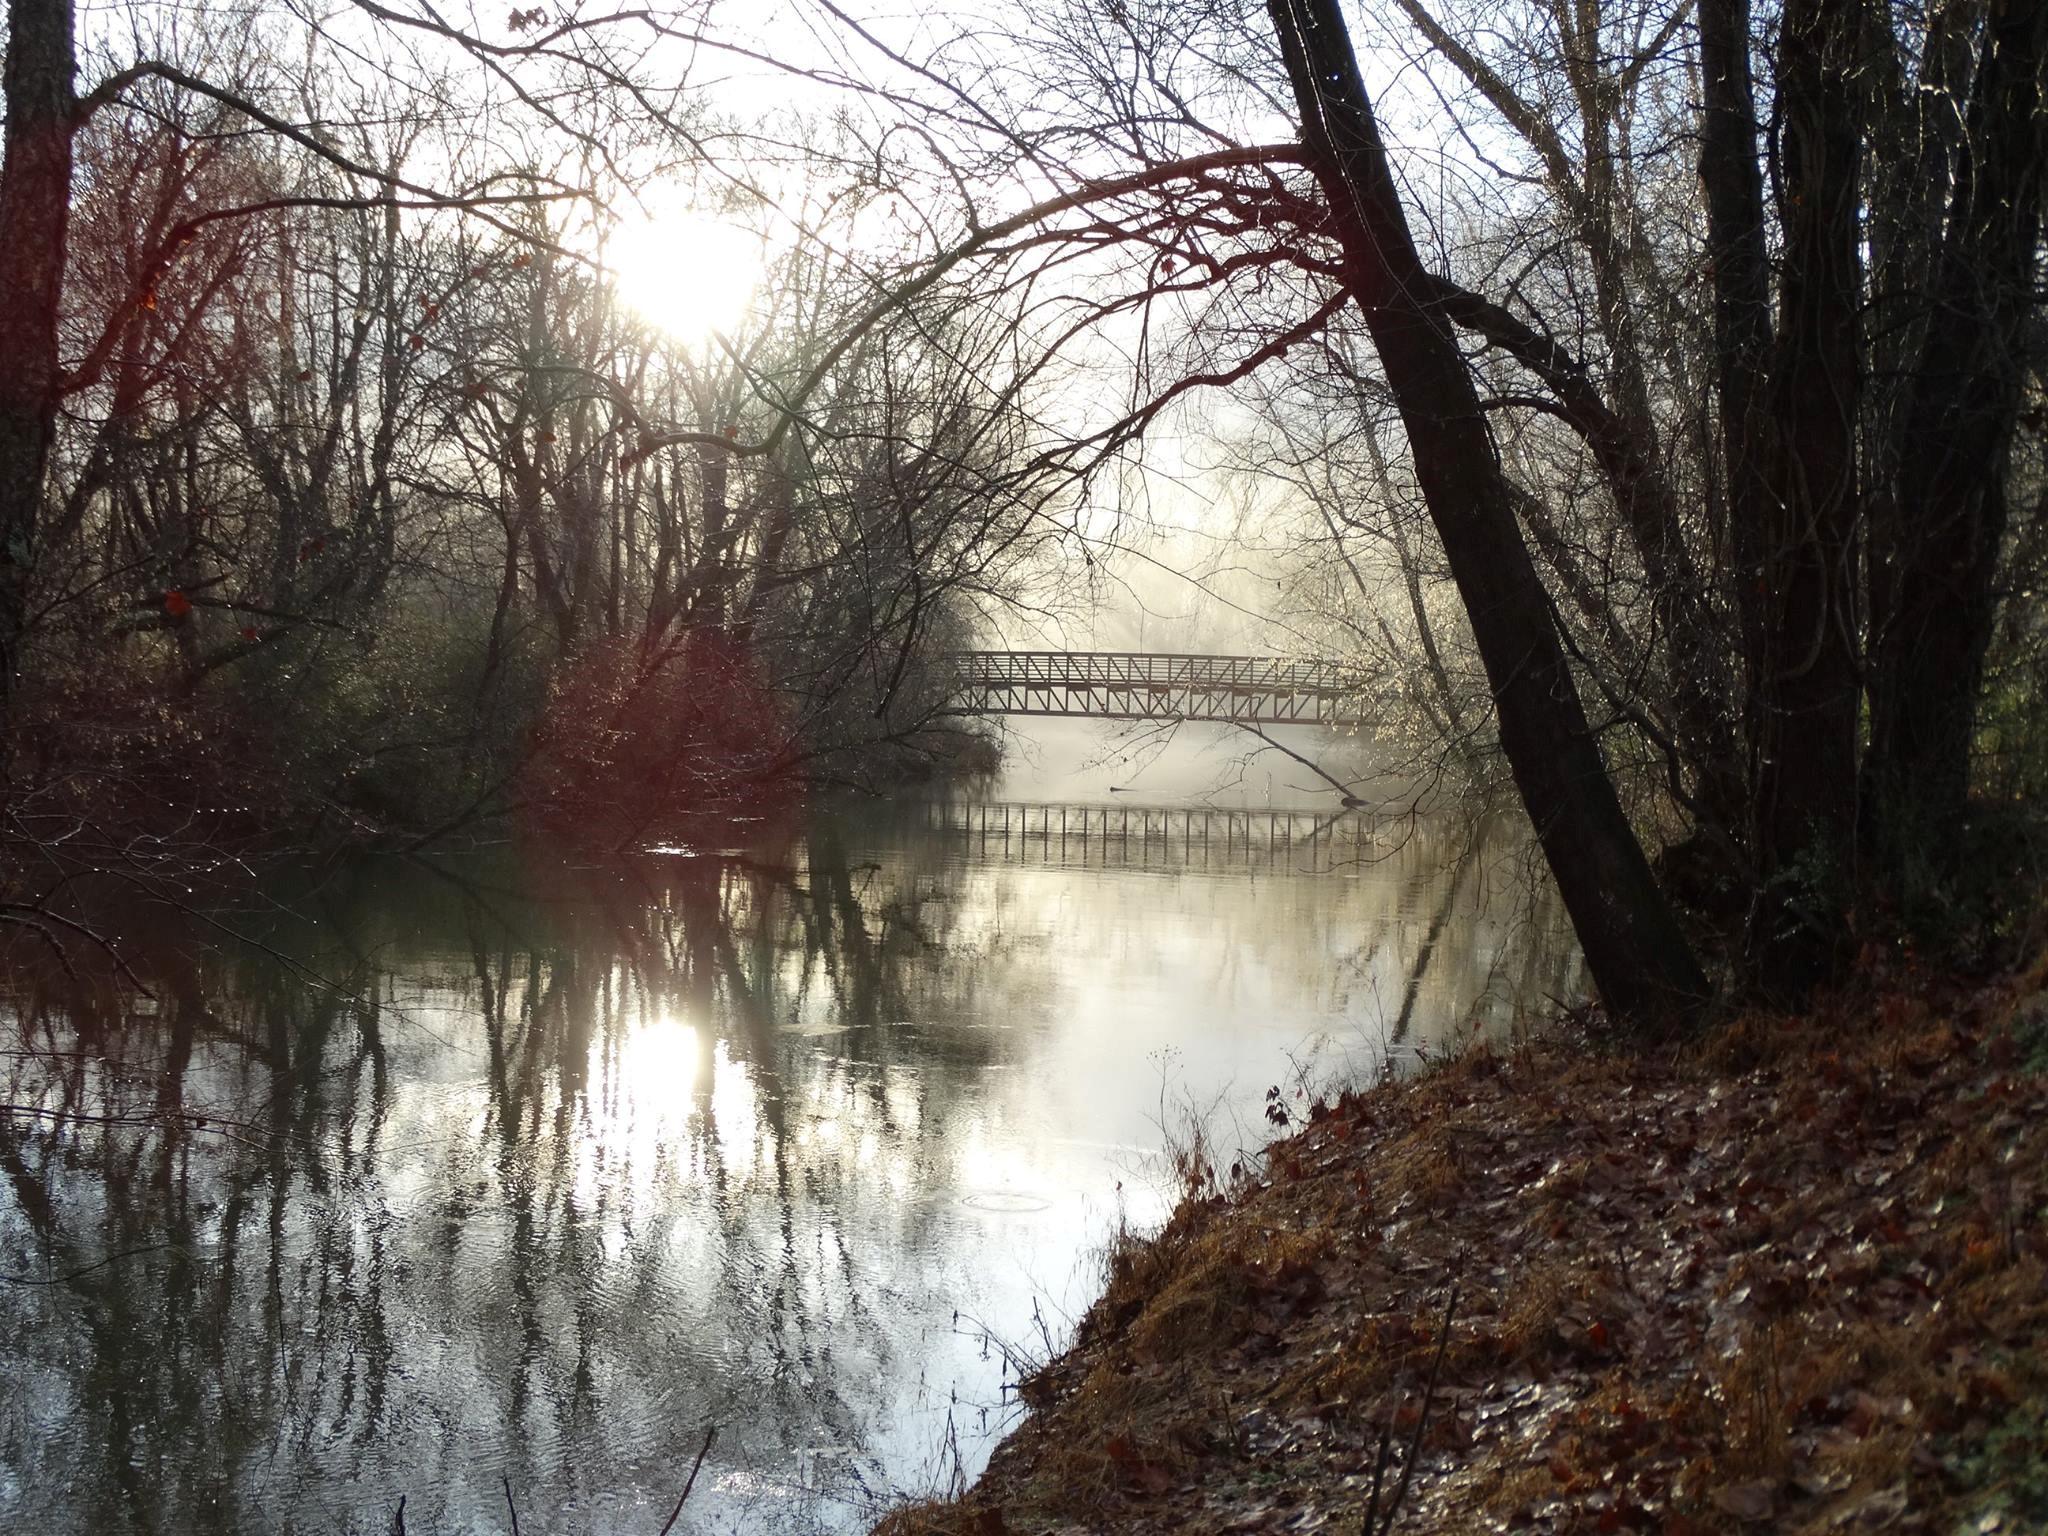 Courtesy of Yadkin River Greenway